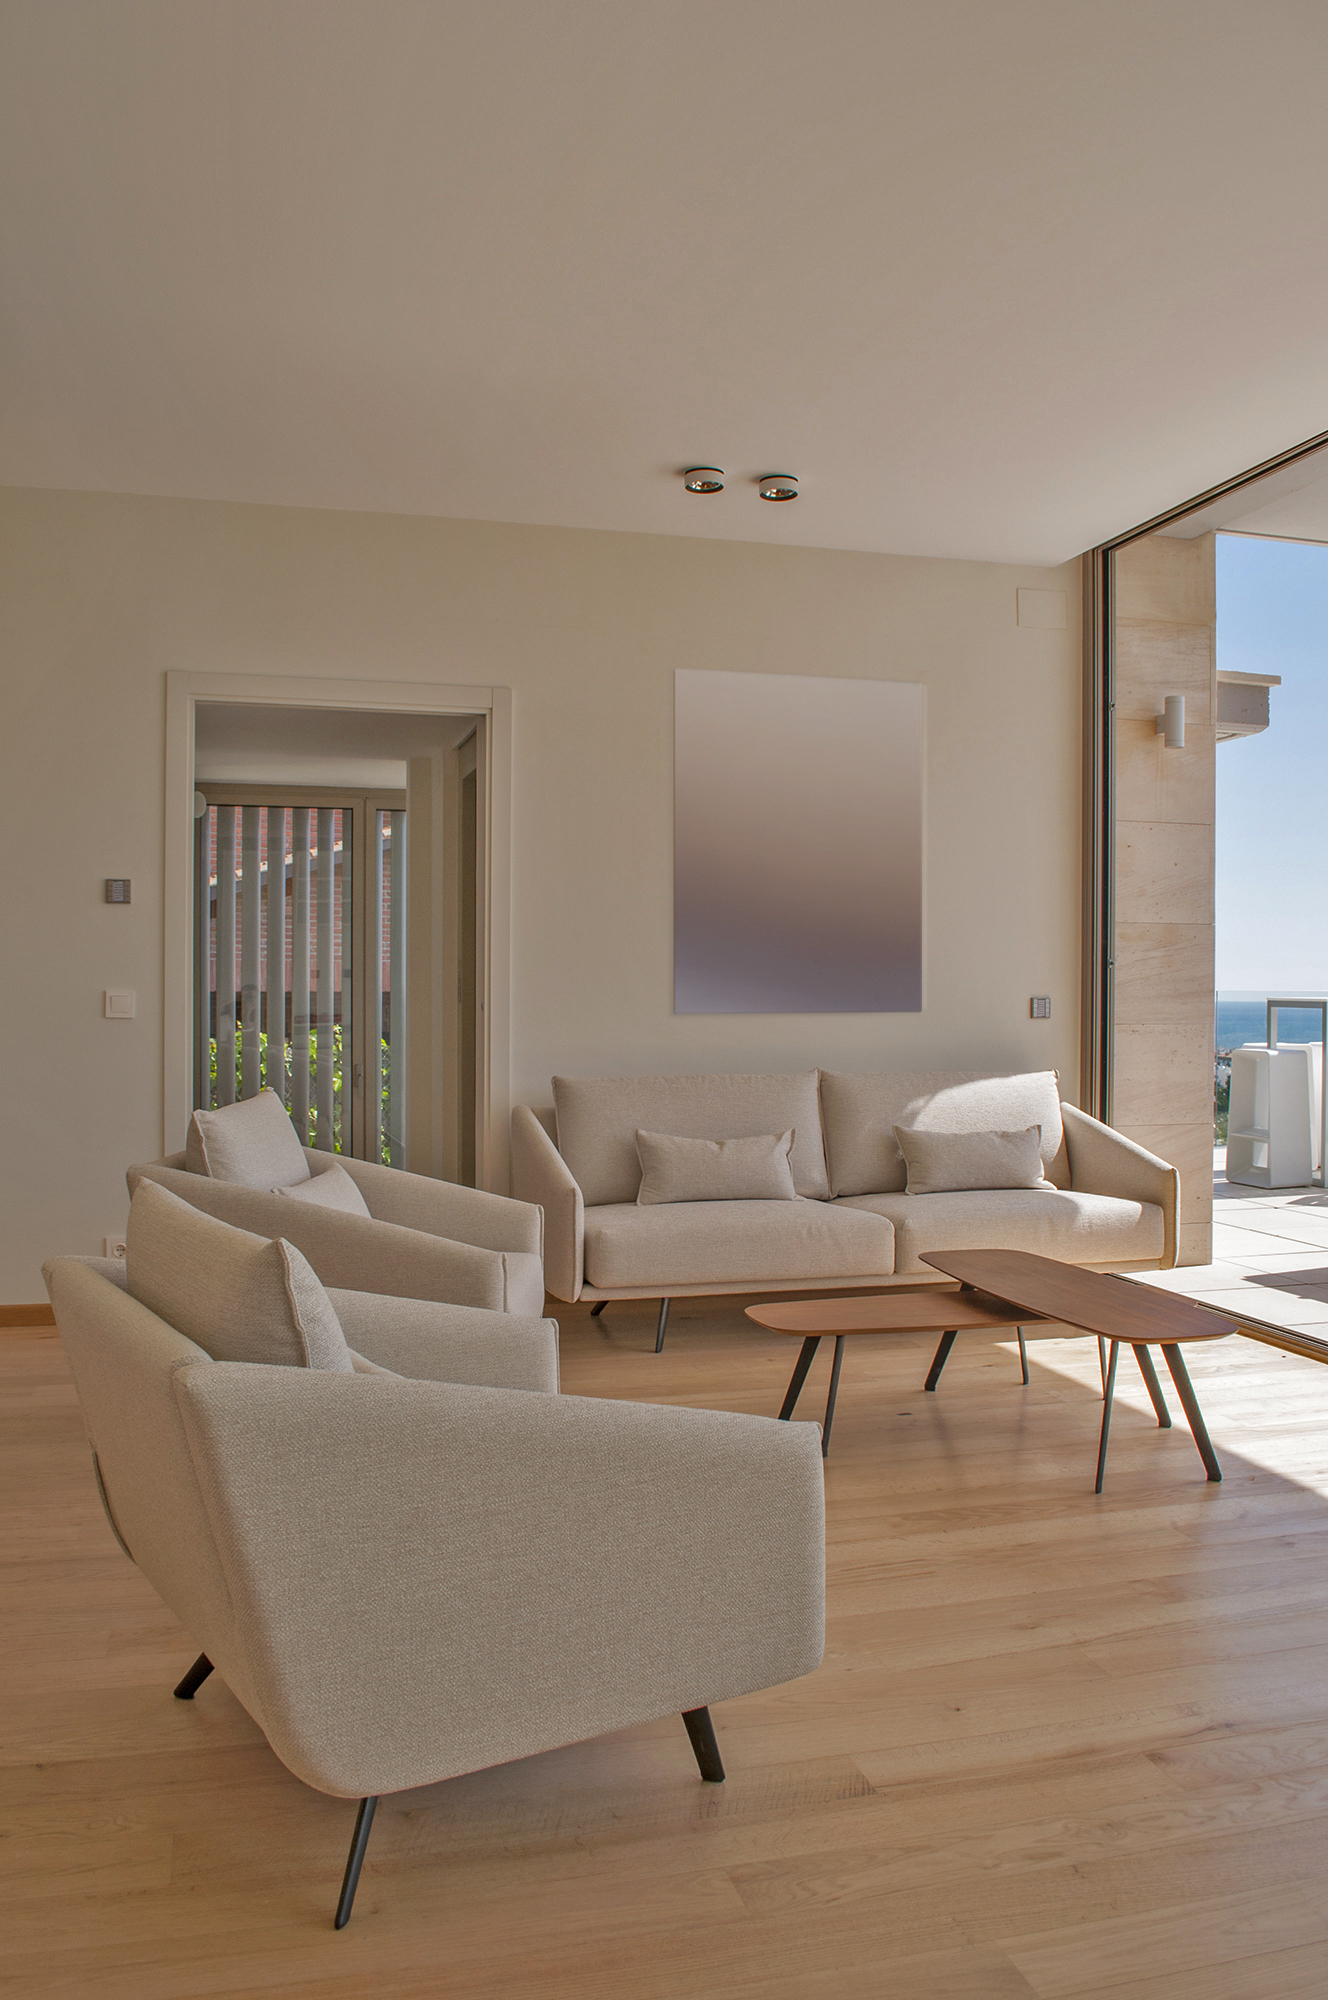 0_rardo-architects-casas-en-sitges-sofas-costura-stua